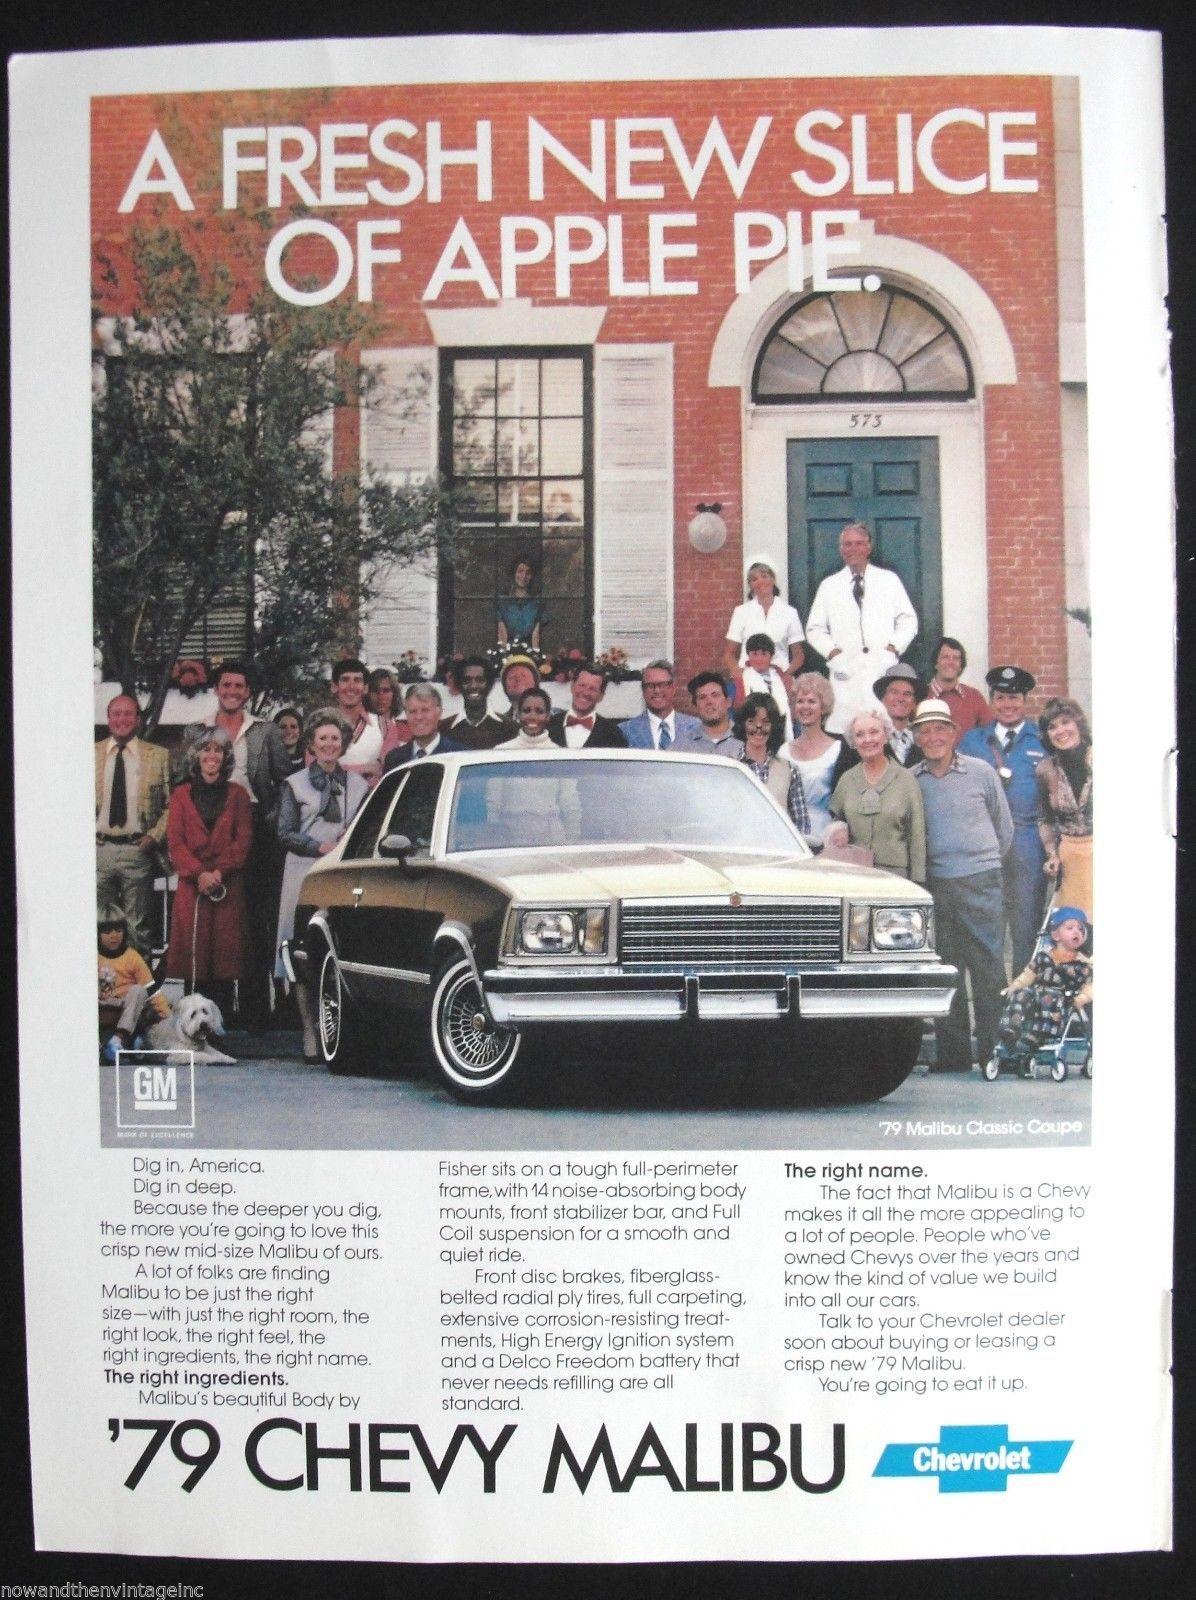 Vintage Ad 1979 Chevrolet Chevy Malibu Apple Pie Saturday Evening